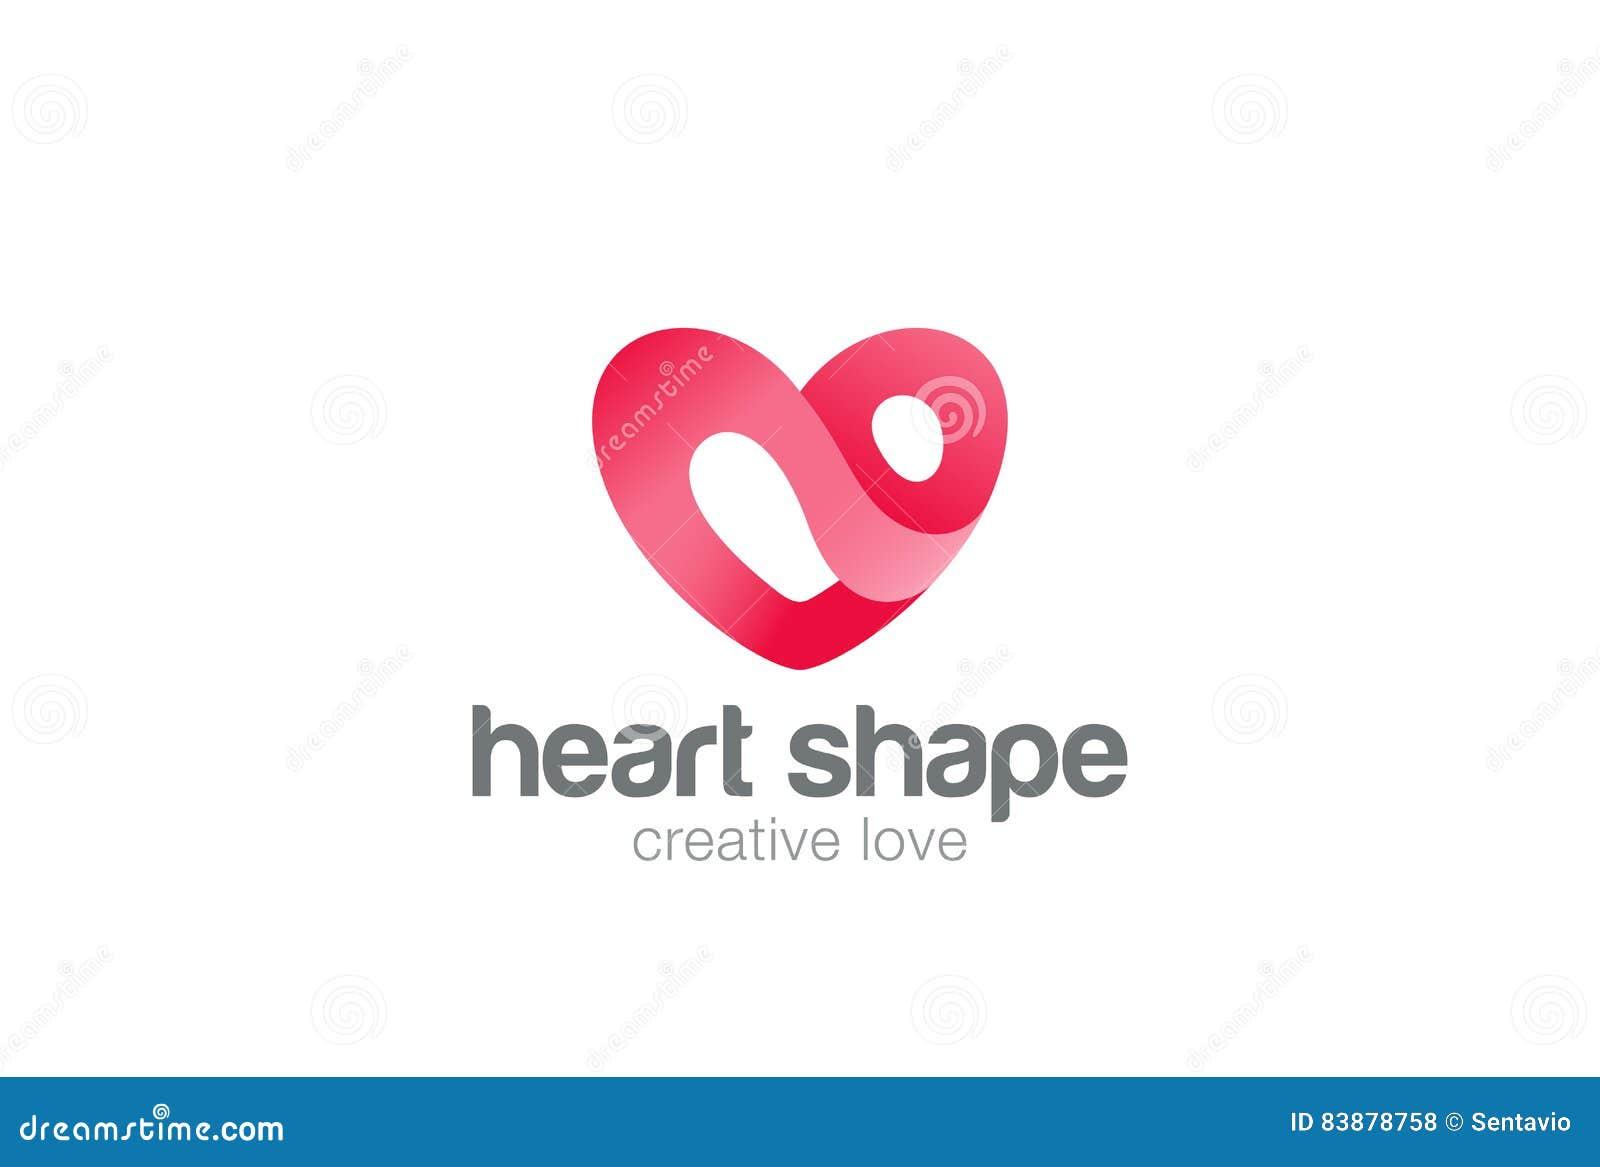 heart logo design vector template st valentine day of